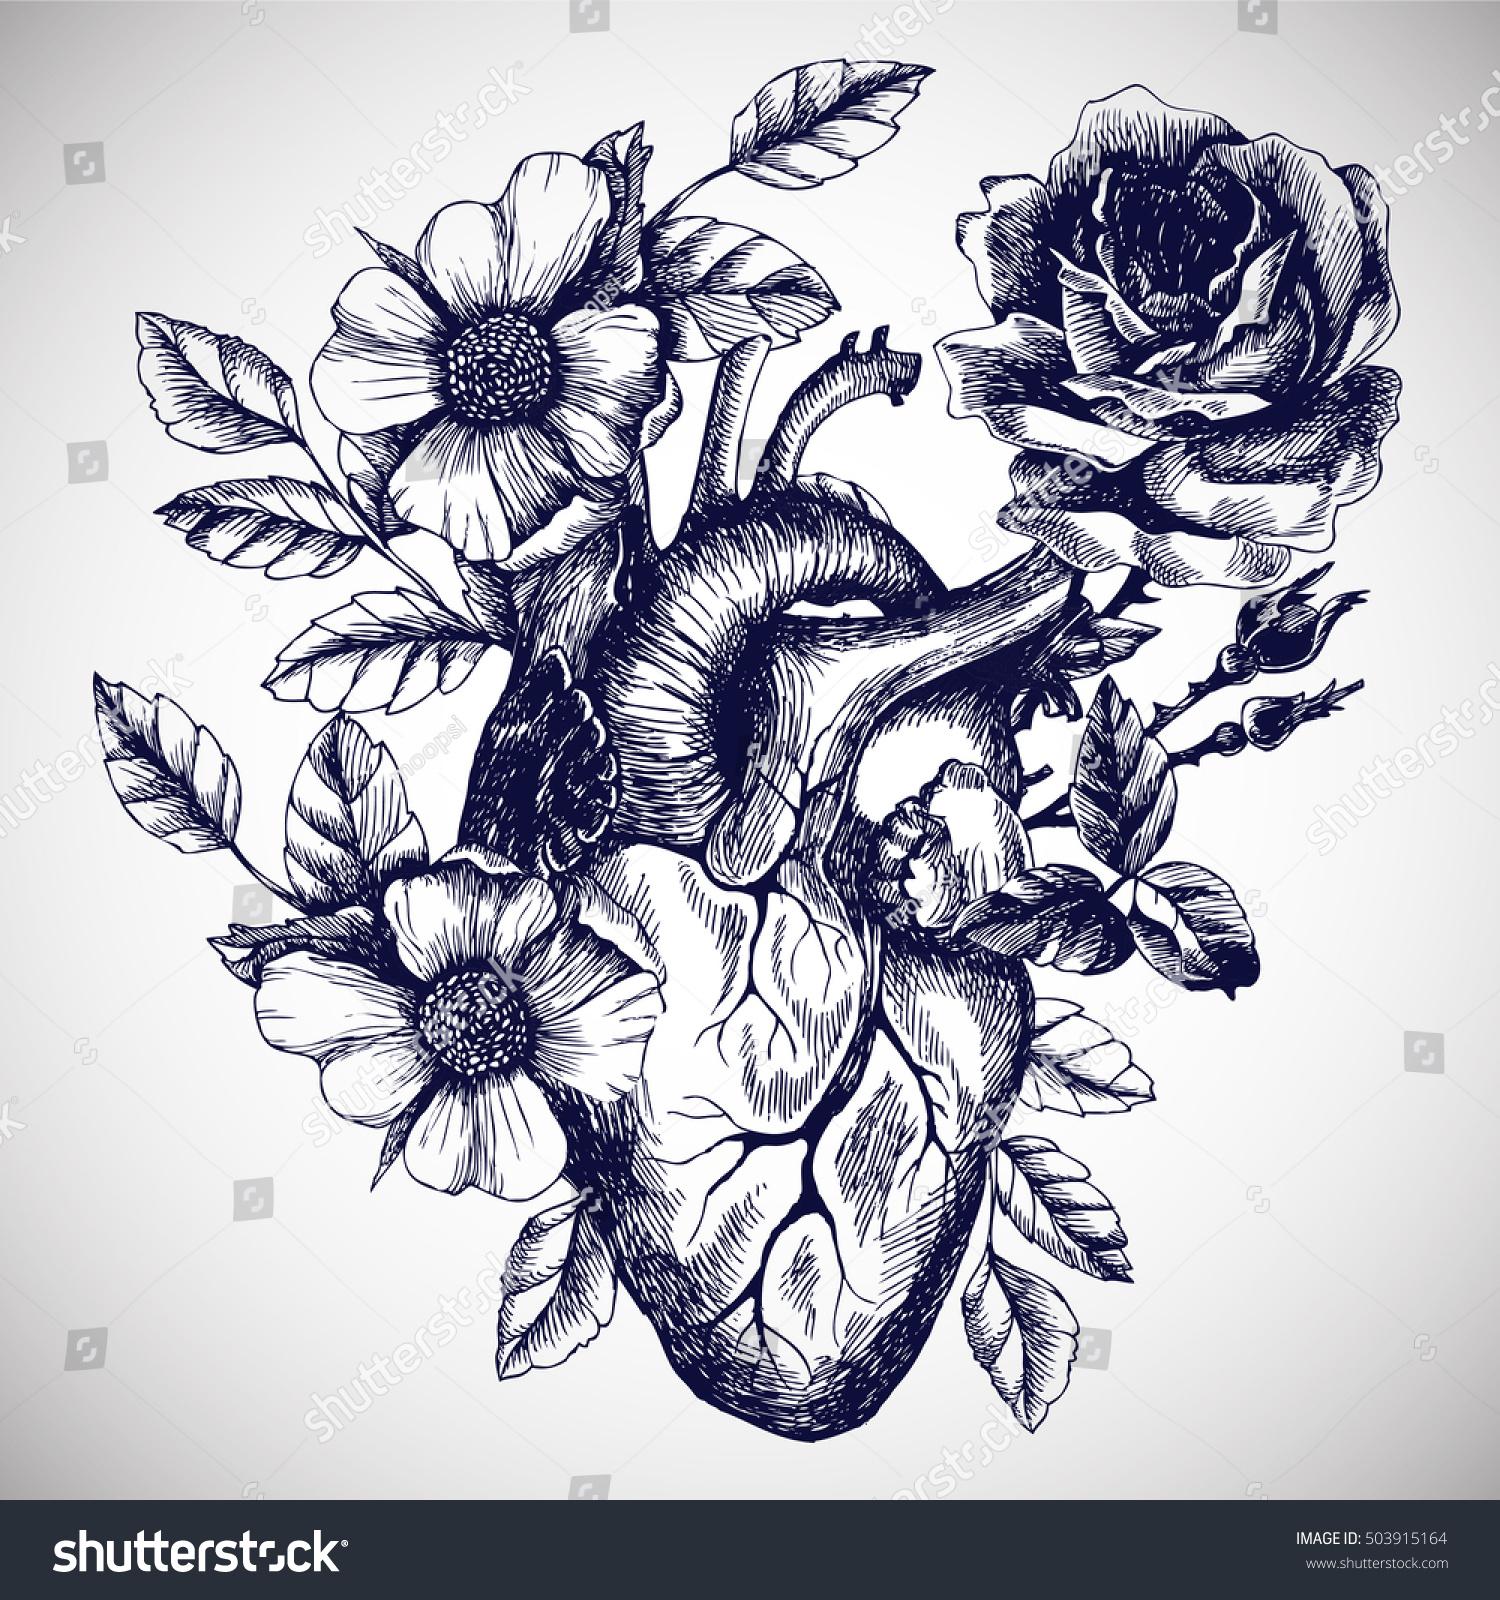 Blooming Anatomical Human Heart Vector Hand Stock Vector (Royalty ...